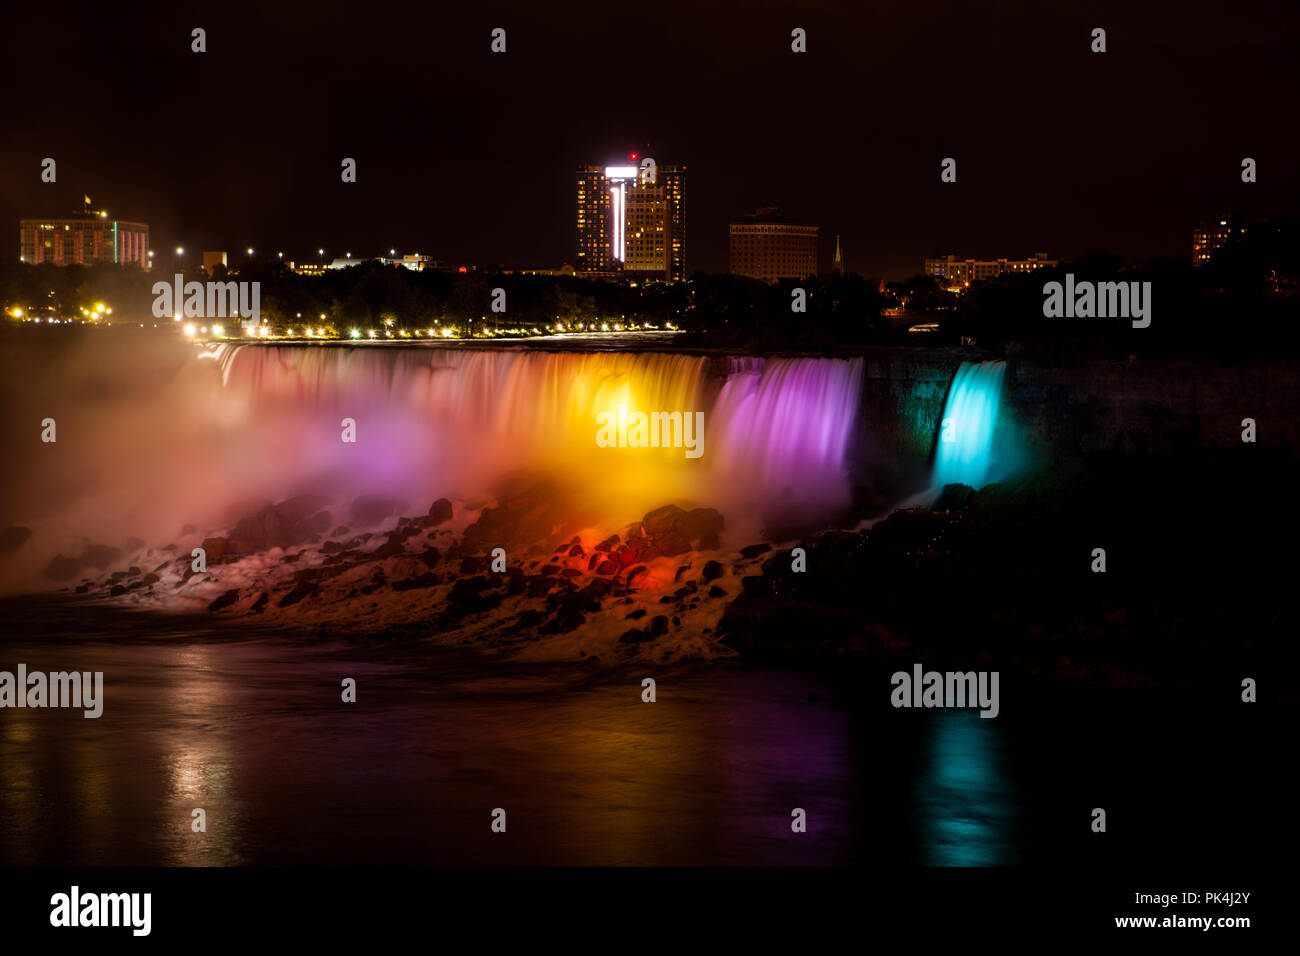 Beleuchtete Niagara Falls - Stock Image